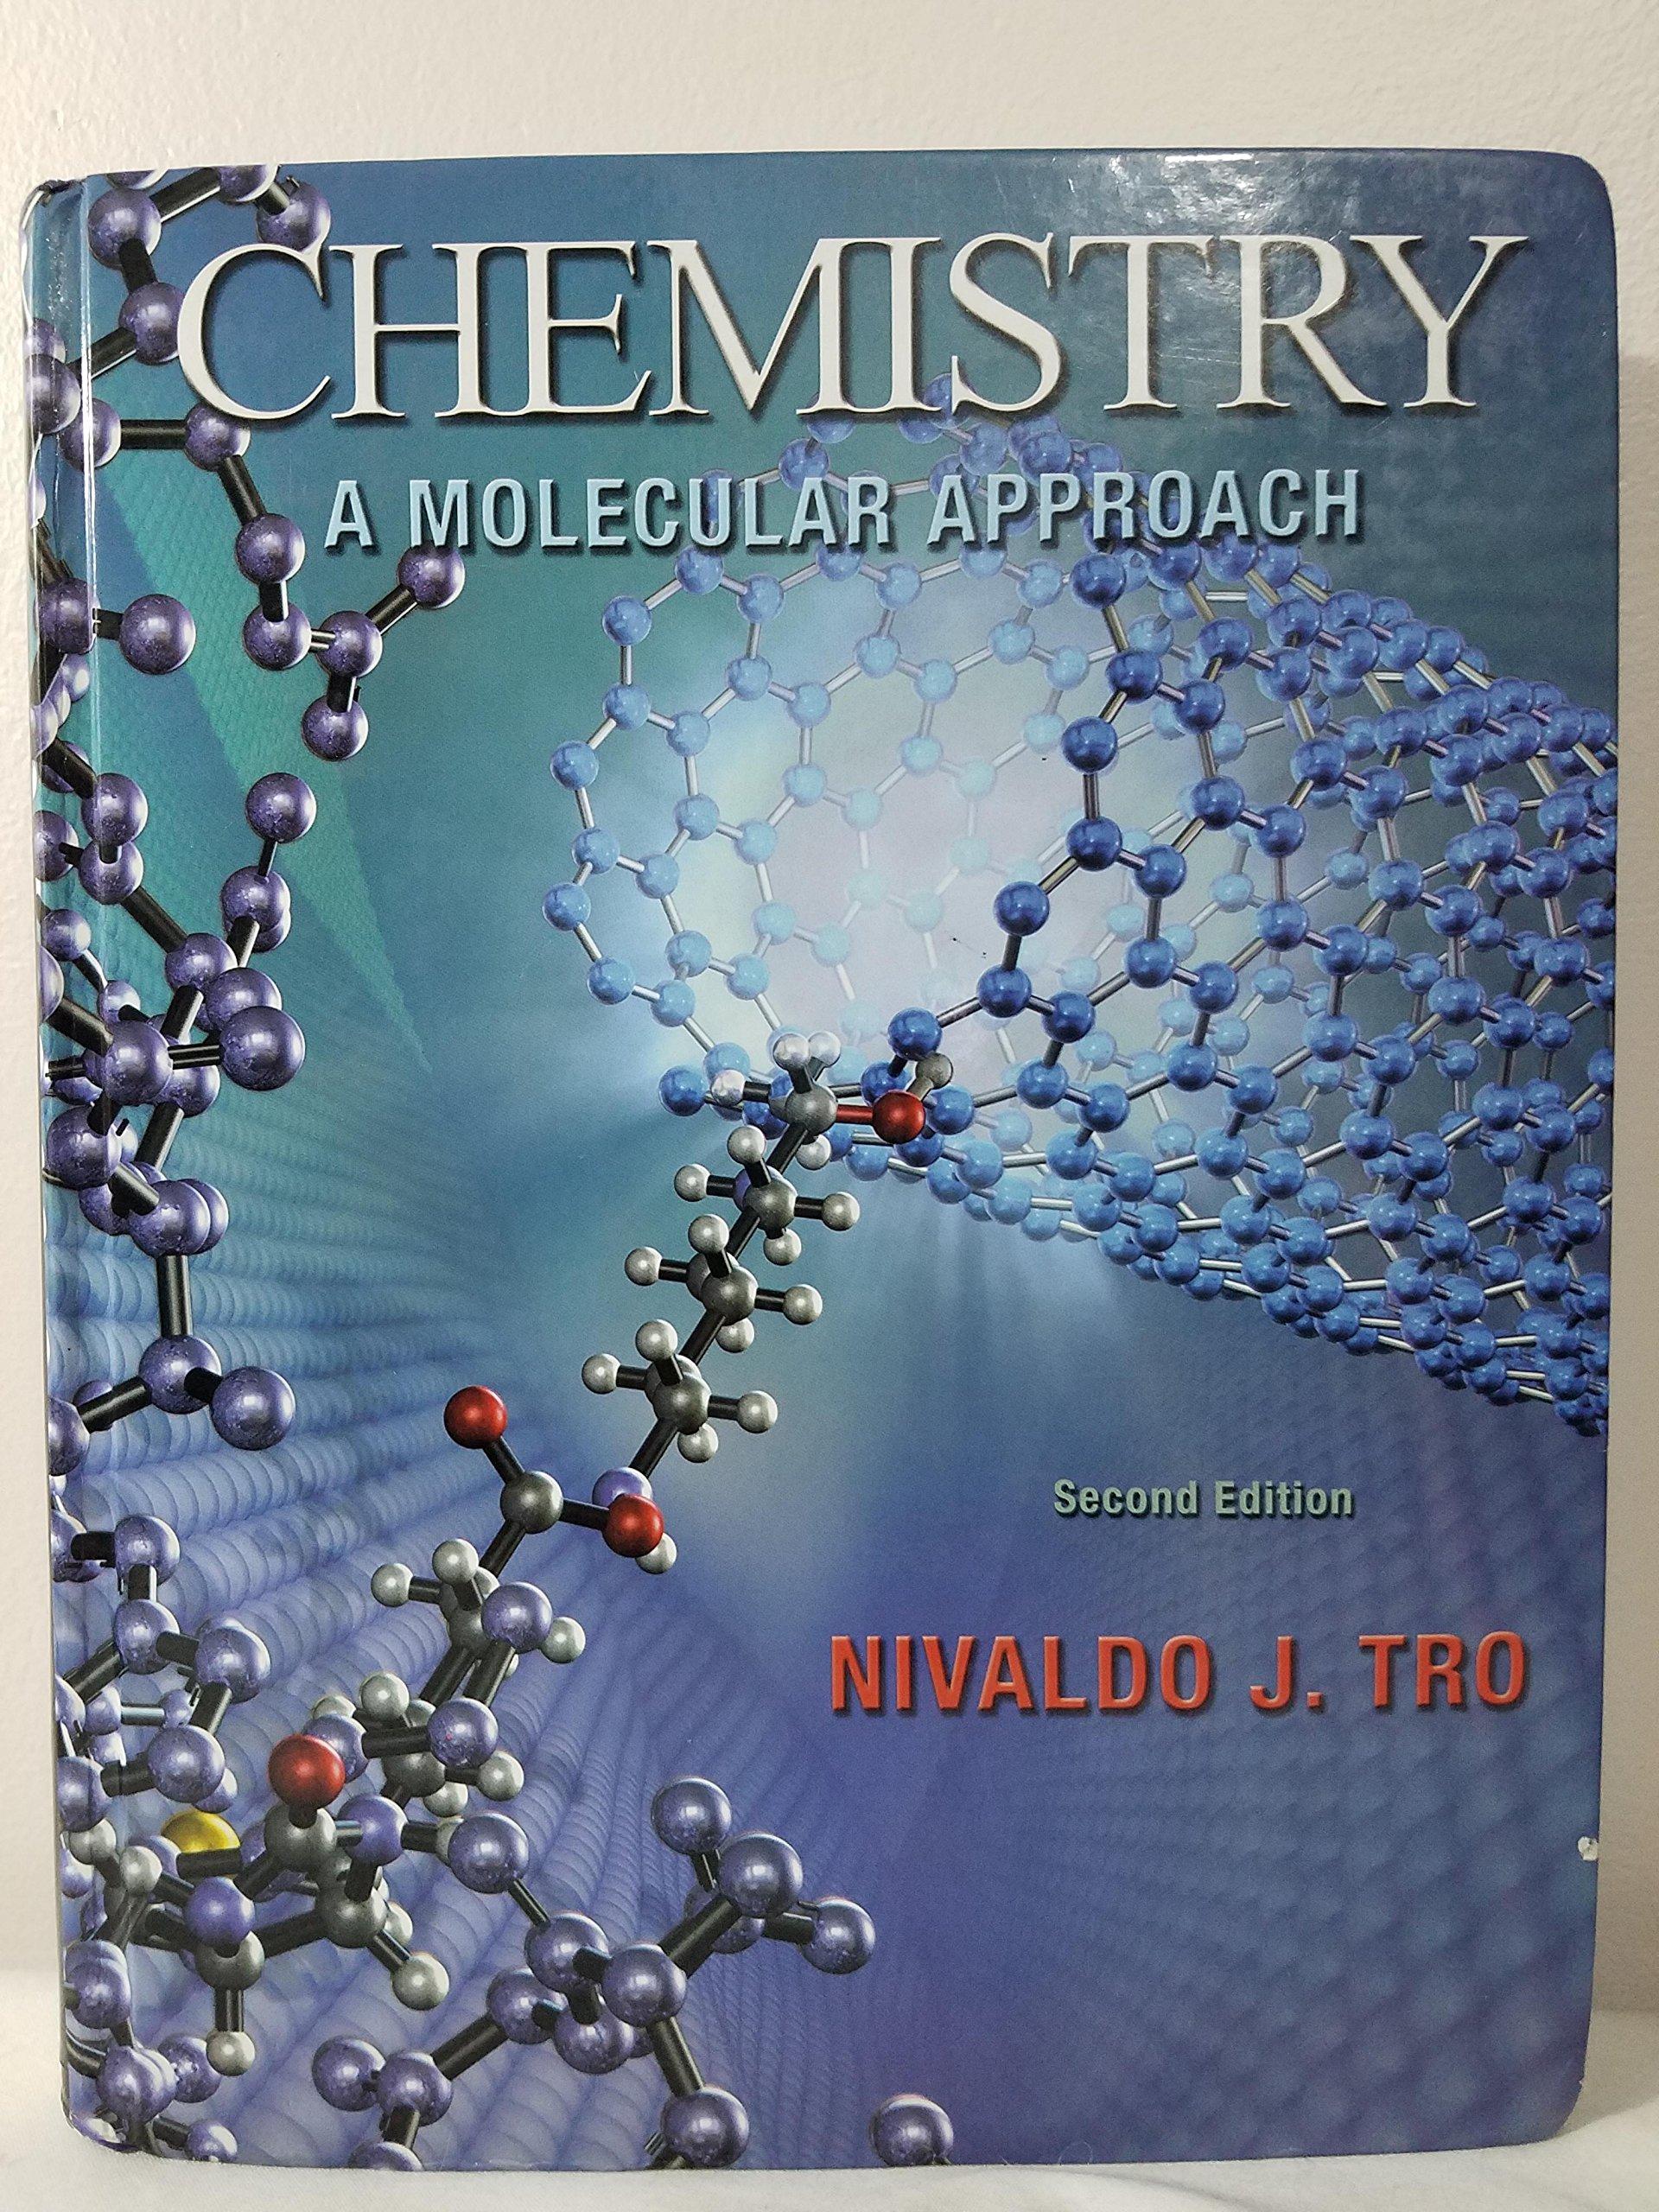 Principles of Chemistry: A Molecular Approach (2nd Edition) [Hardcover] [ 2012] 2 Ed. Nivaldo J. Tro: Tro: Amazon.com: Books